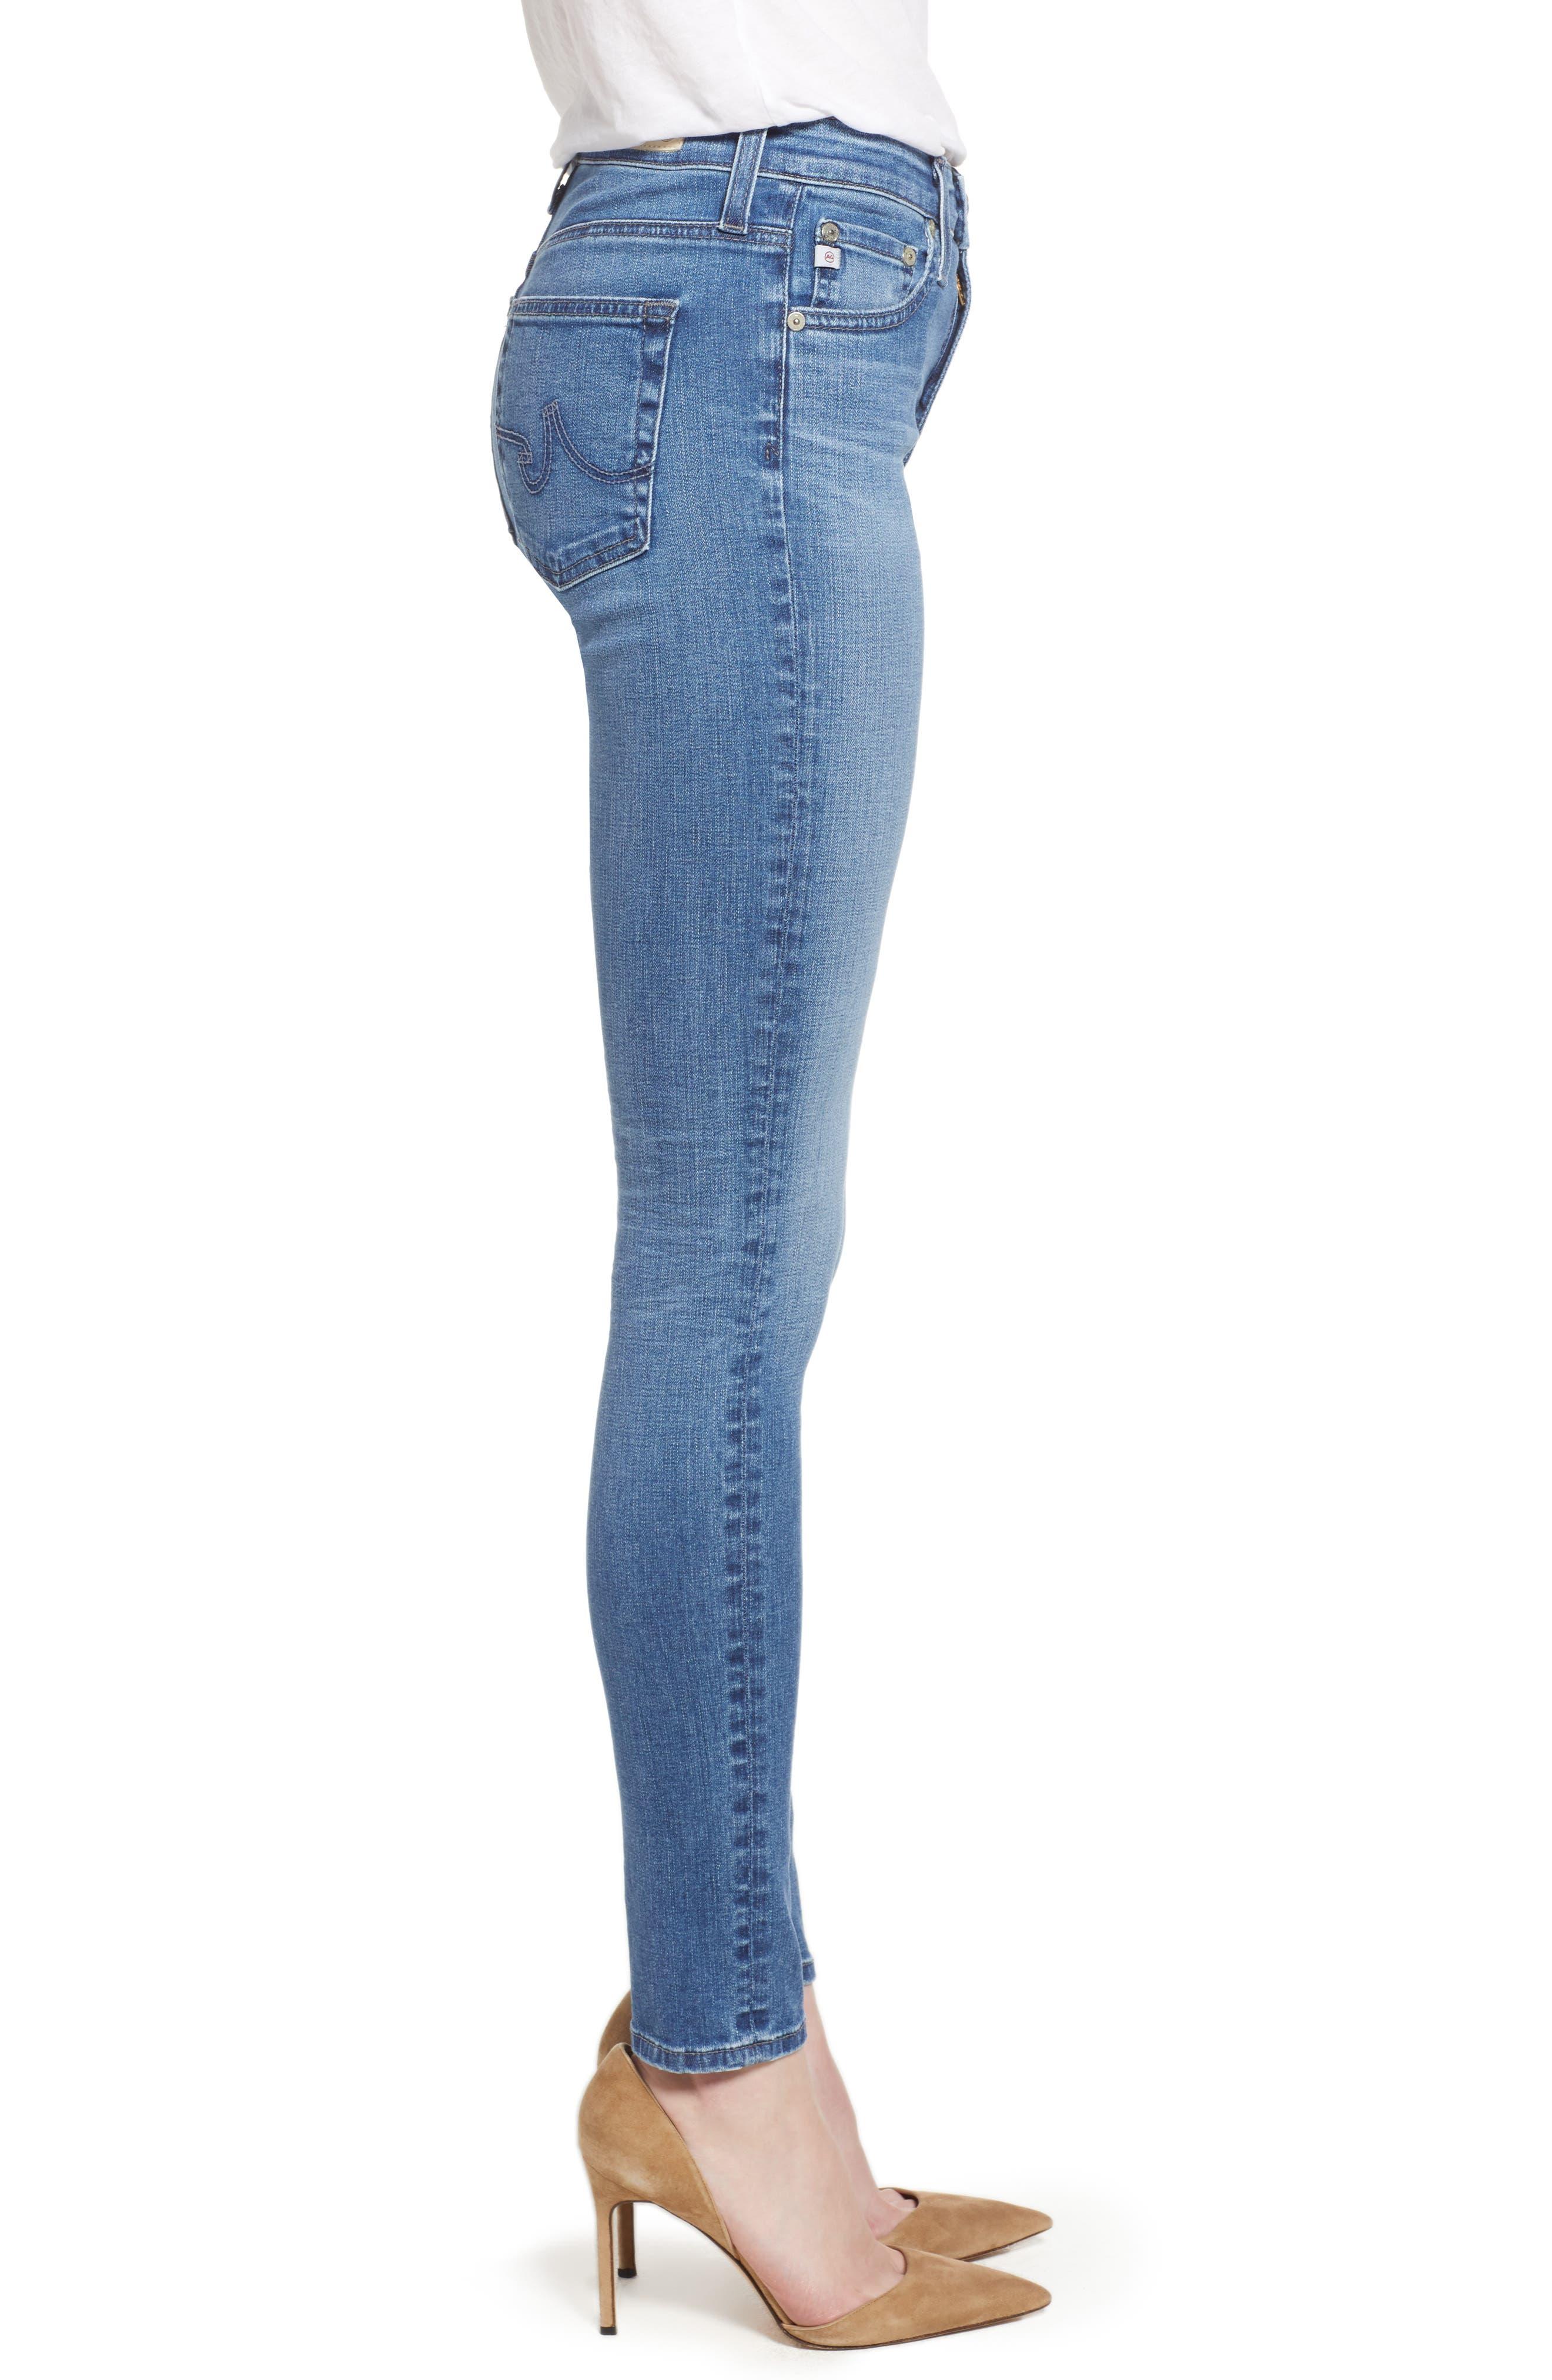 'The Farrah' High Rise Skinny Jeans,                             Alternate thumbnail 27, color,